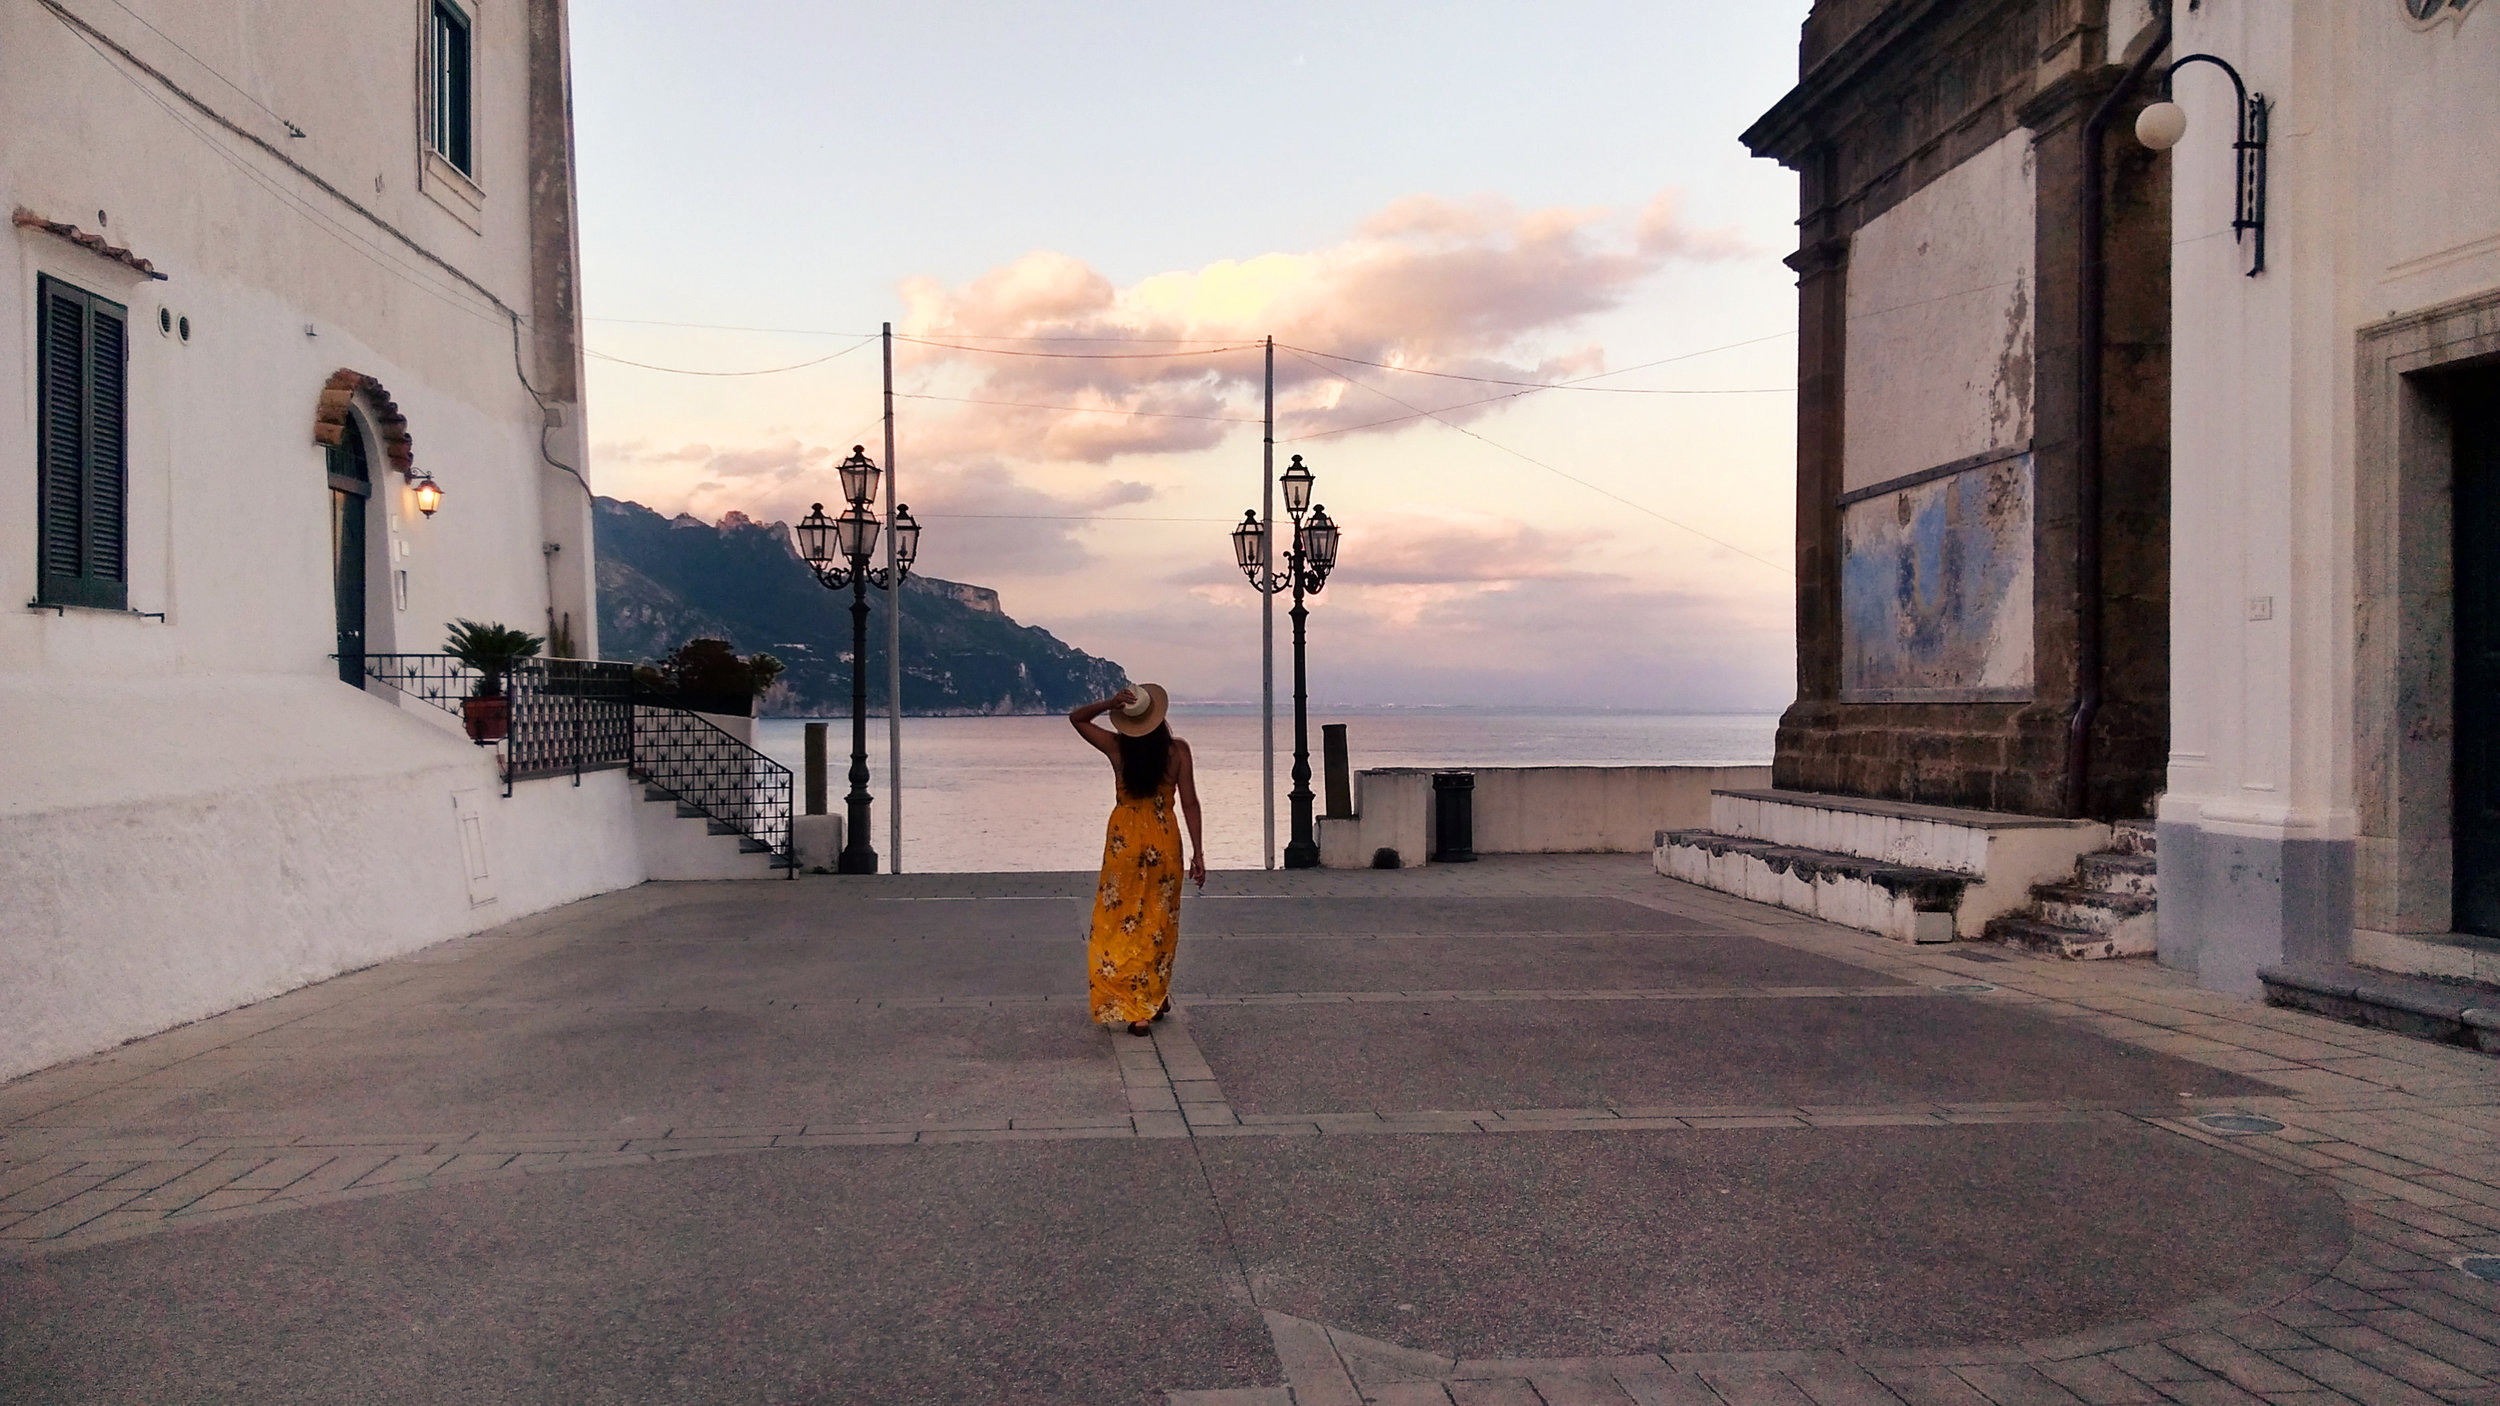 Nuova-Photo_Lifestyle-Photographer_Travel_Italy_1.jpg